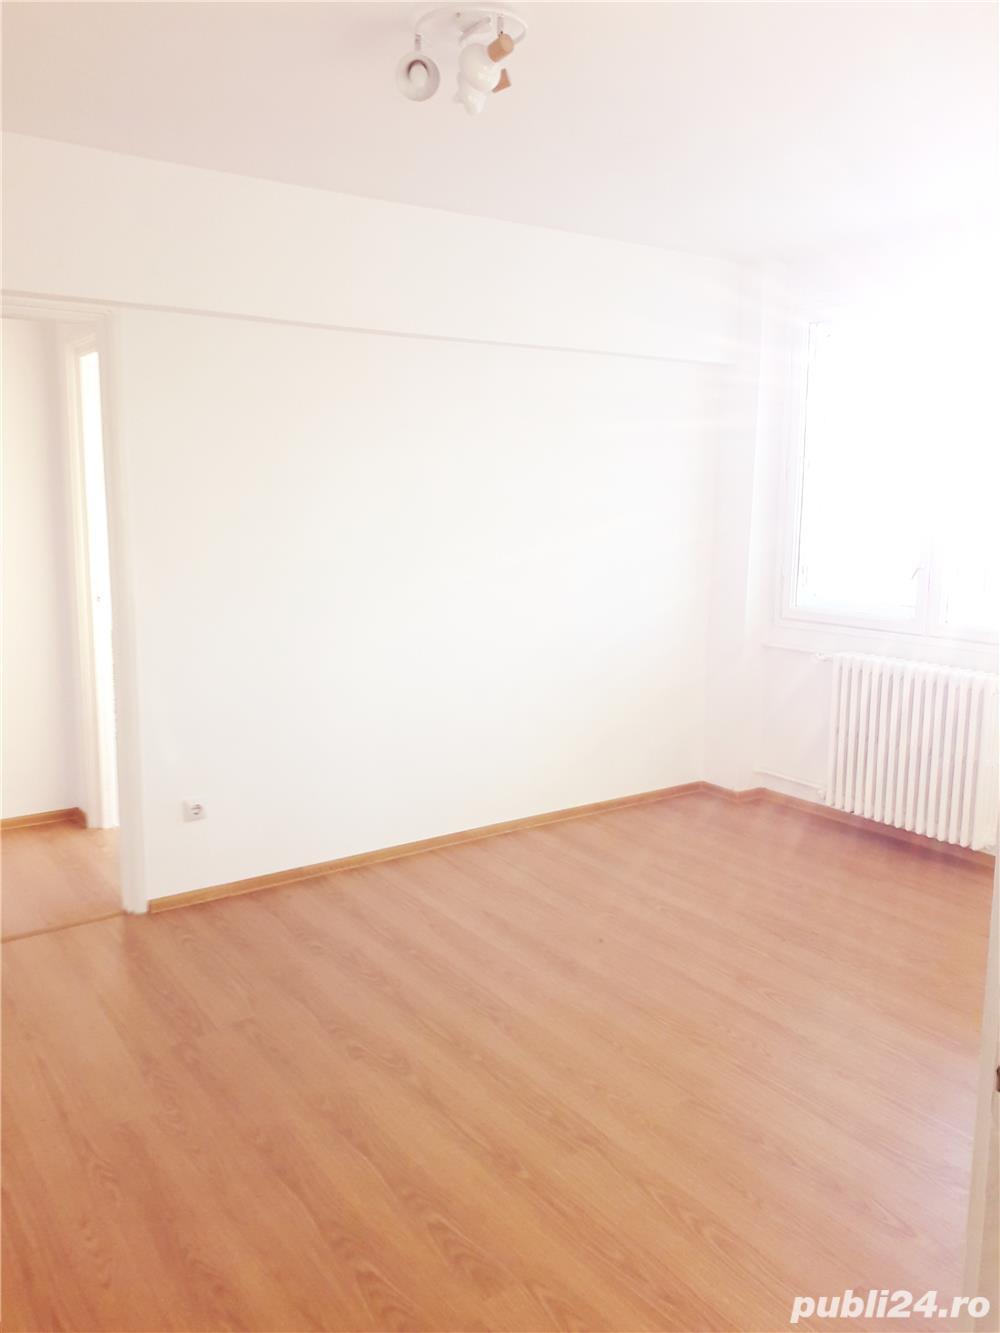 Inchiriere apartament 2 camere, cu o pozitionare avantajoasa, metrou Piata Muncii